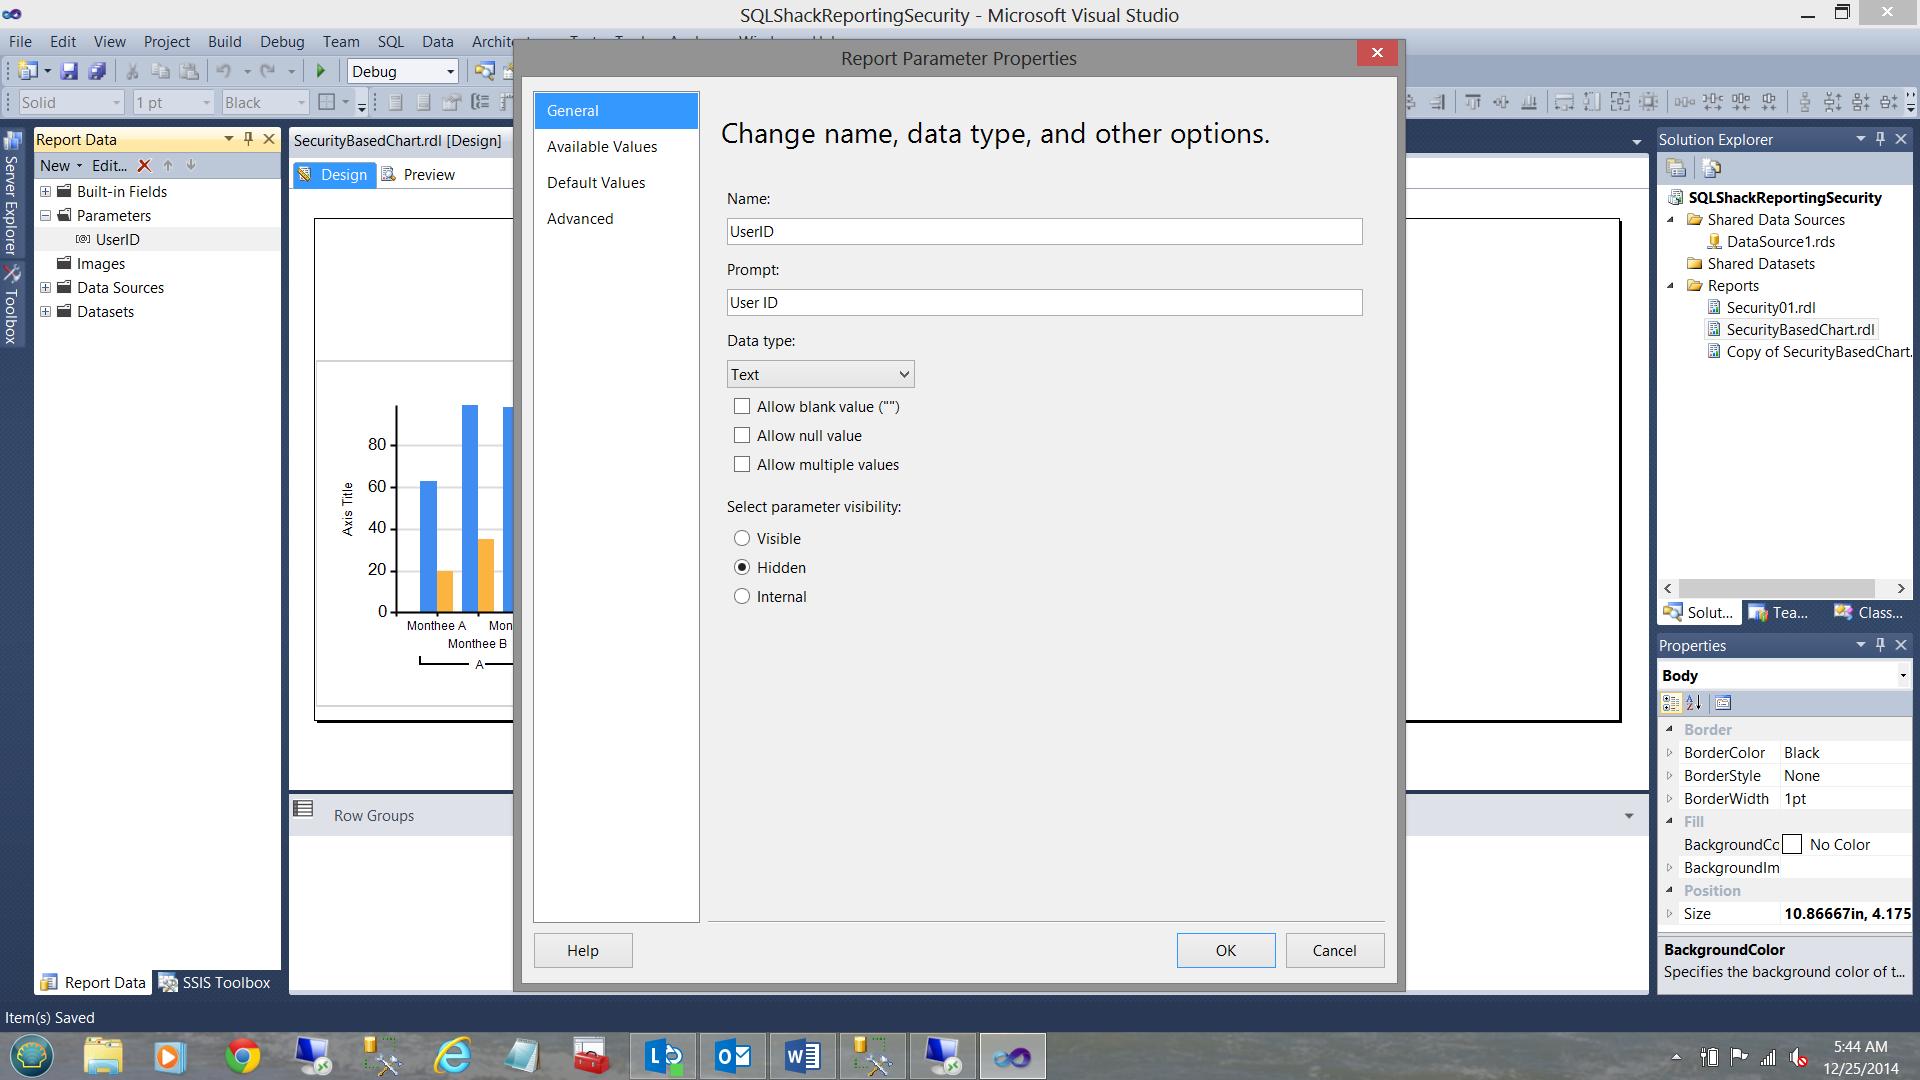 SQL Server安全机制–如何控制用户能够在报告中查看哪些数据27